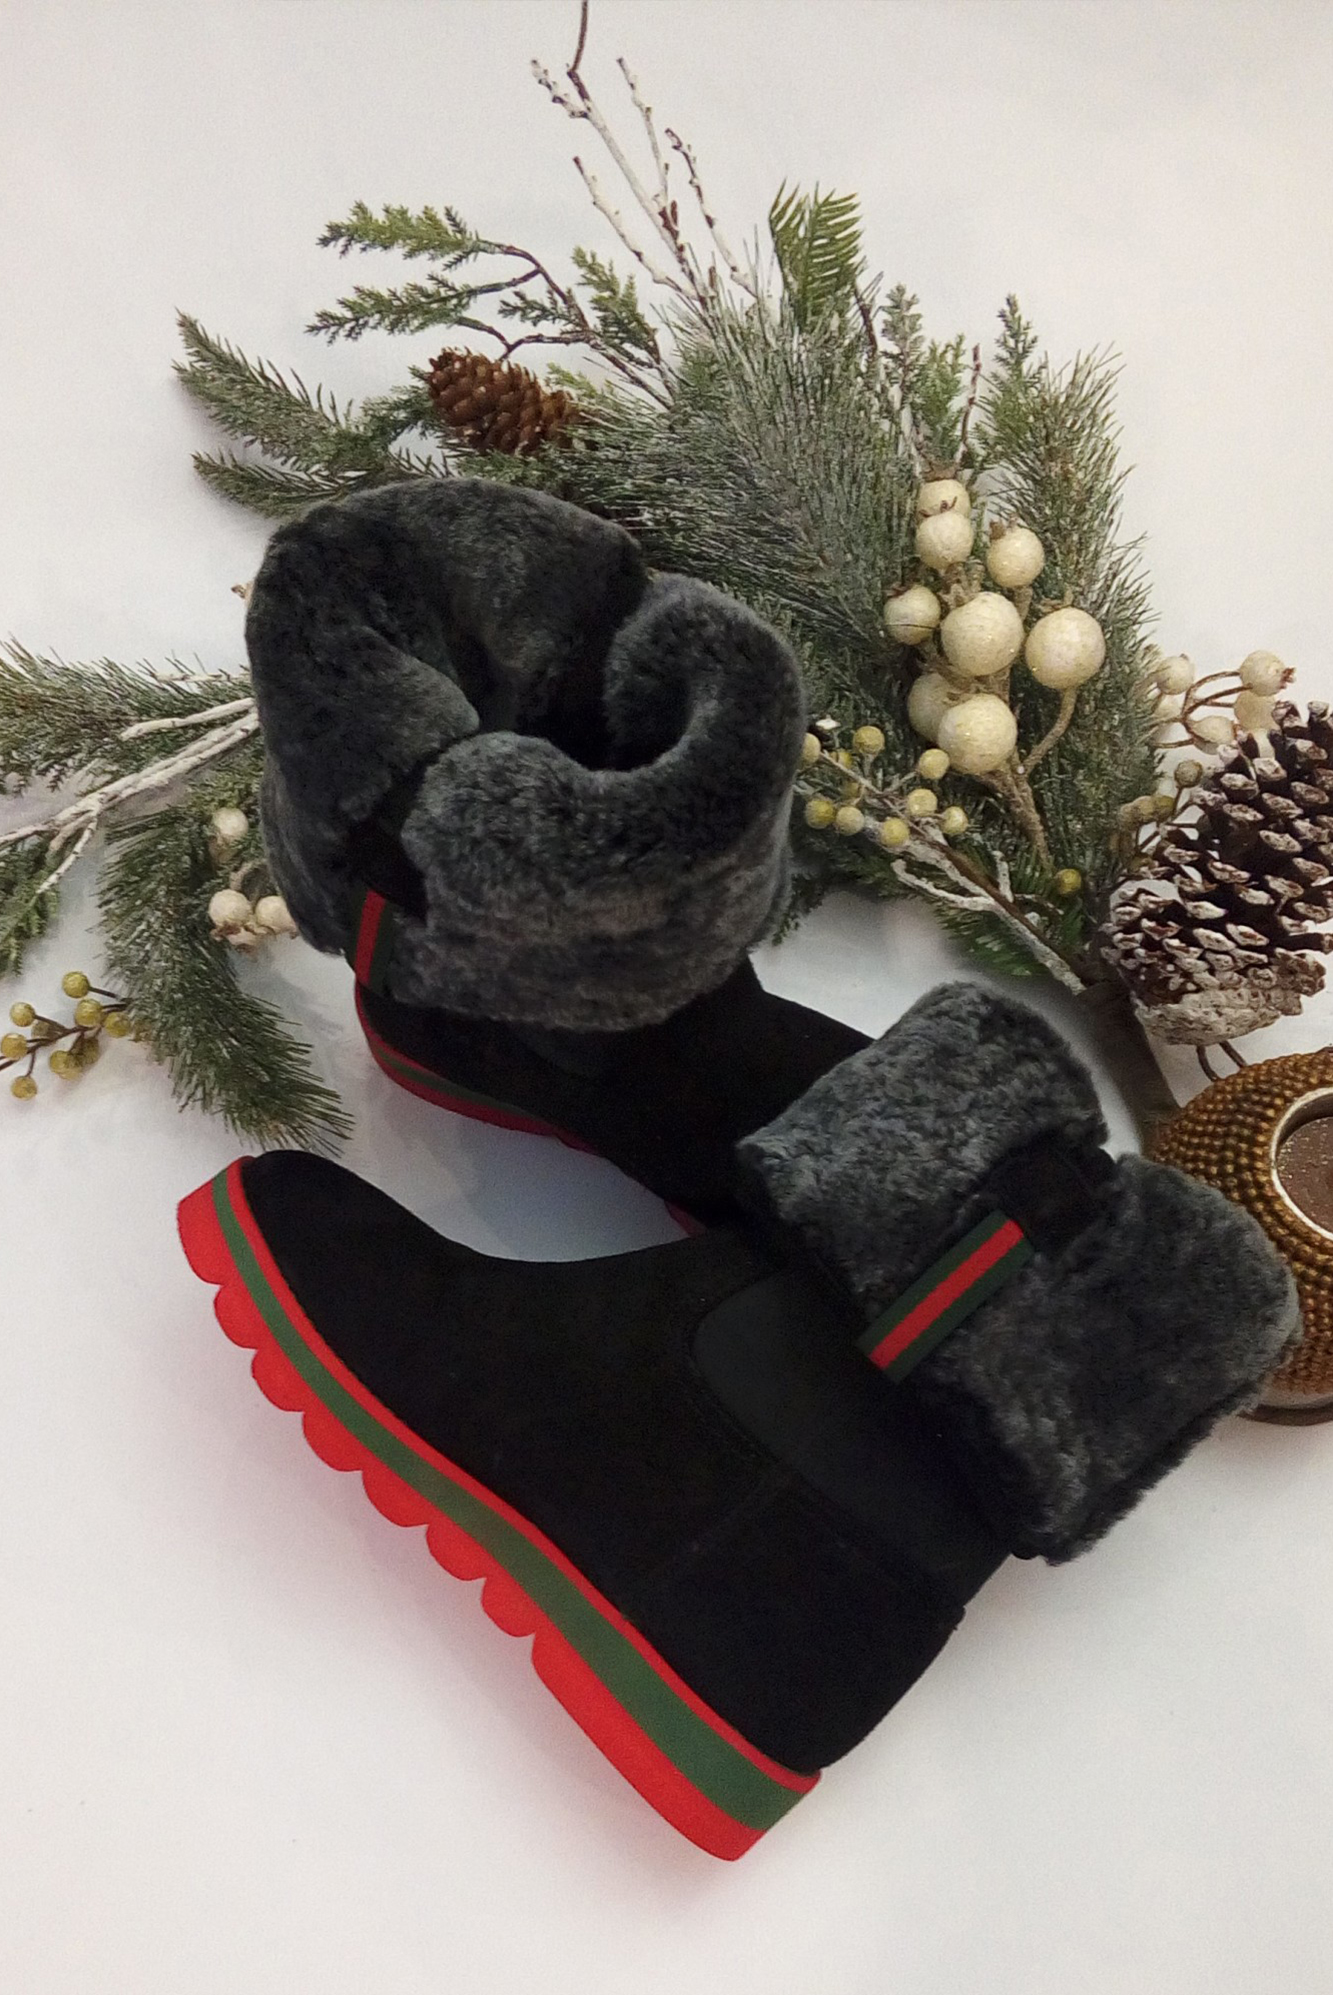 Dámske čierne zateplené čižmy s kožušinou - 36